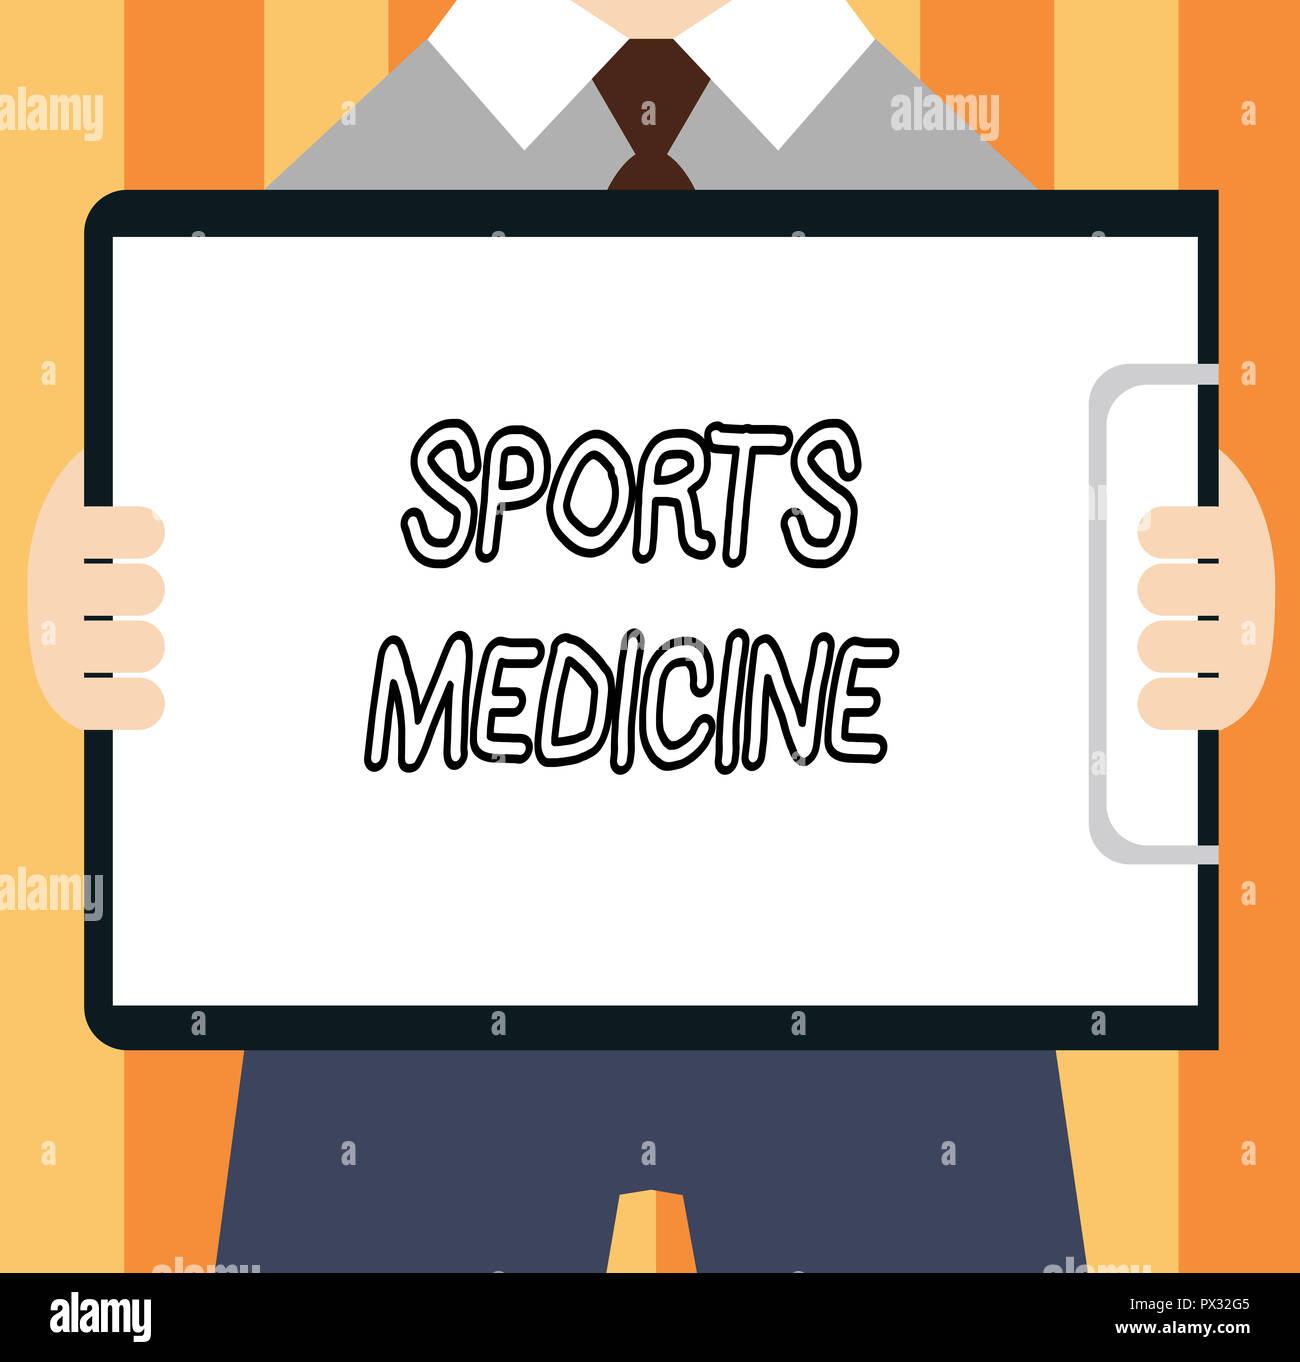 SPORTS MEDICINE CONCEPT